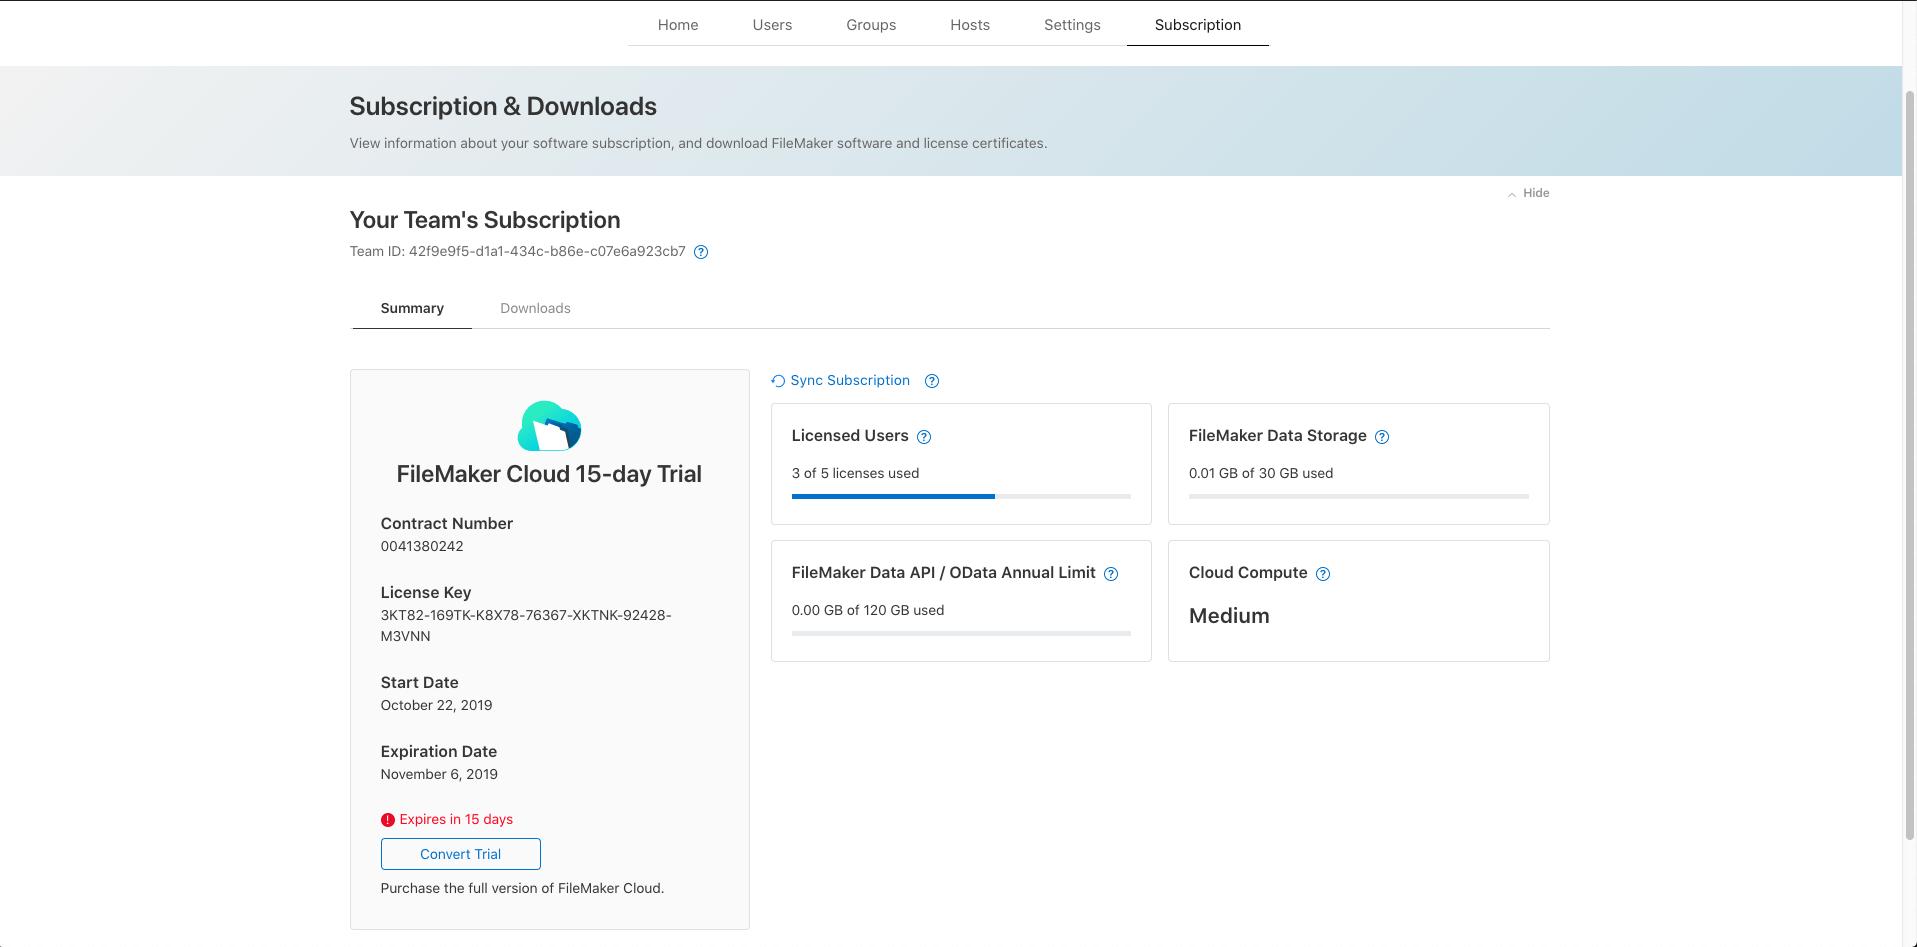 FileMaker Cloud Subscription